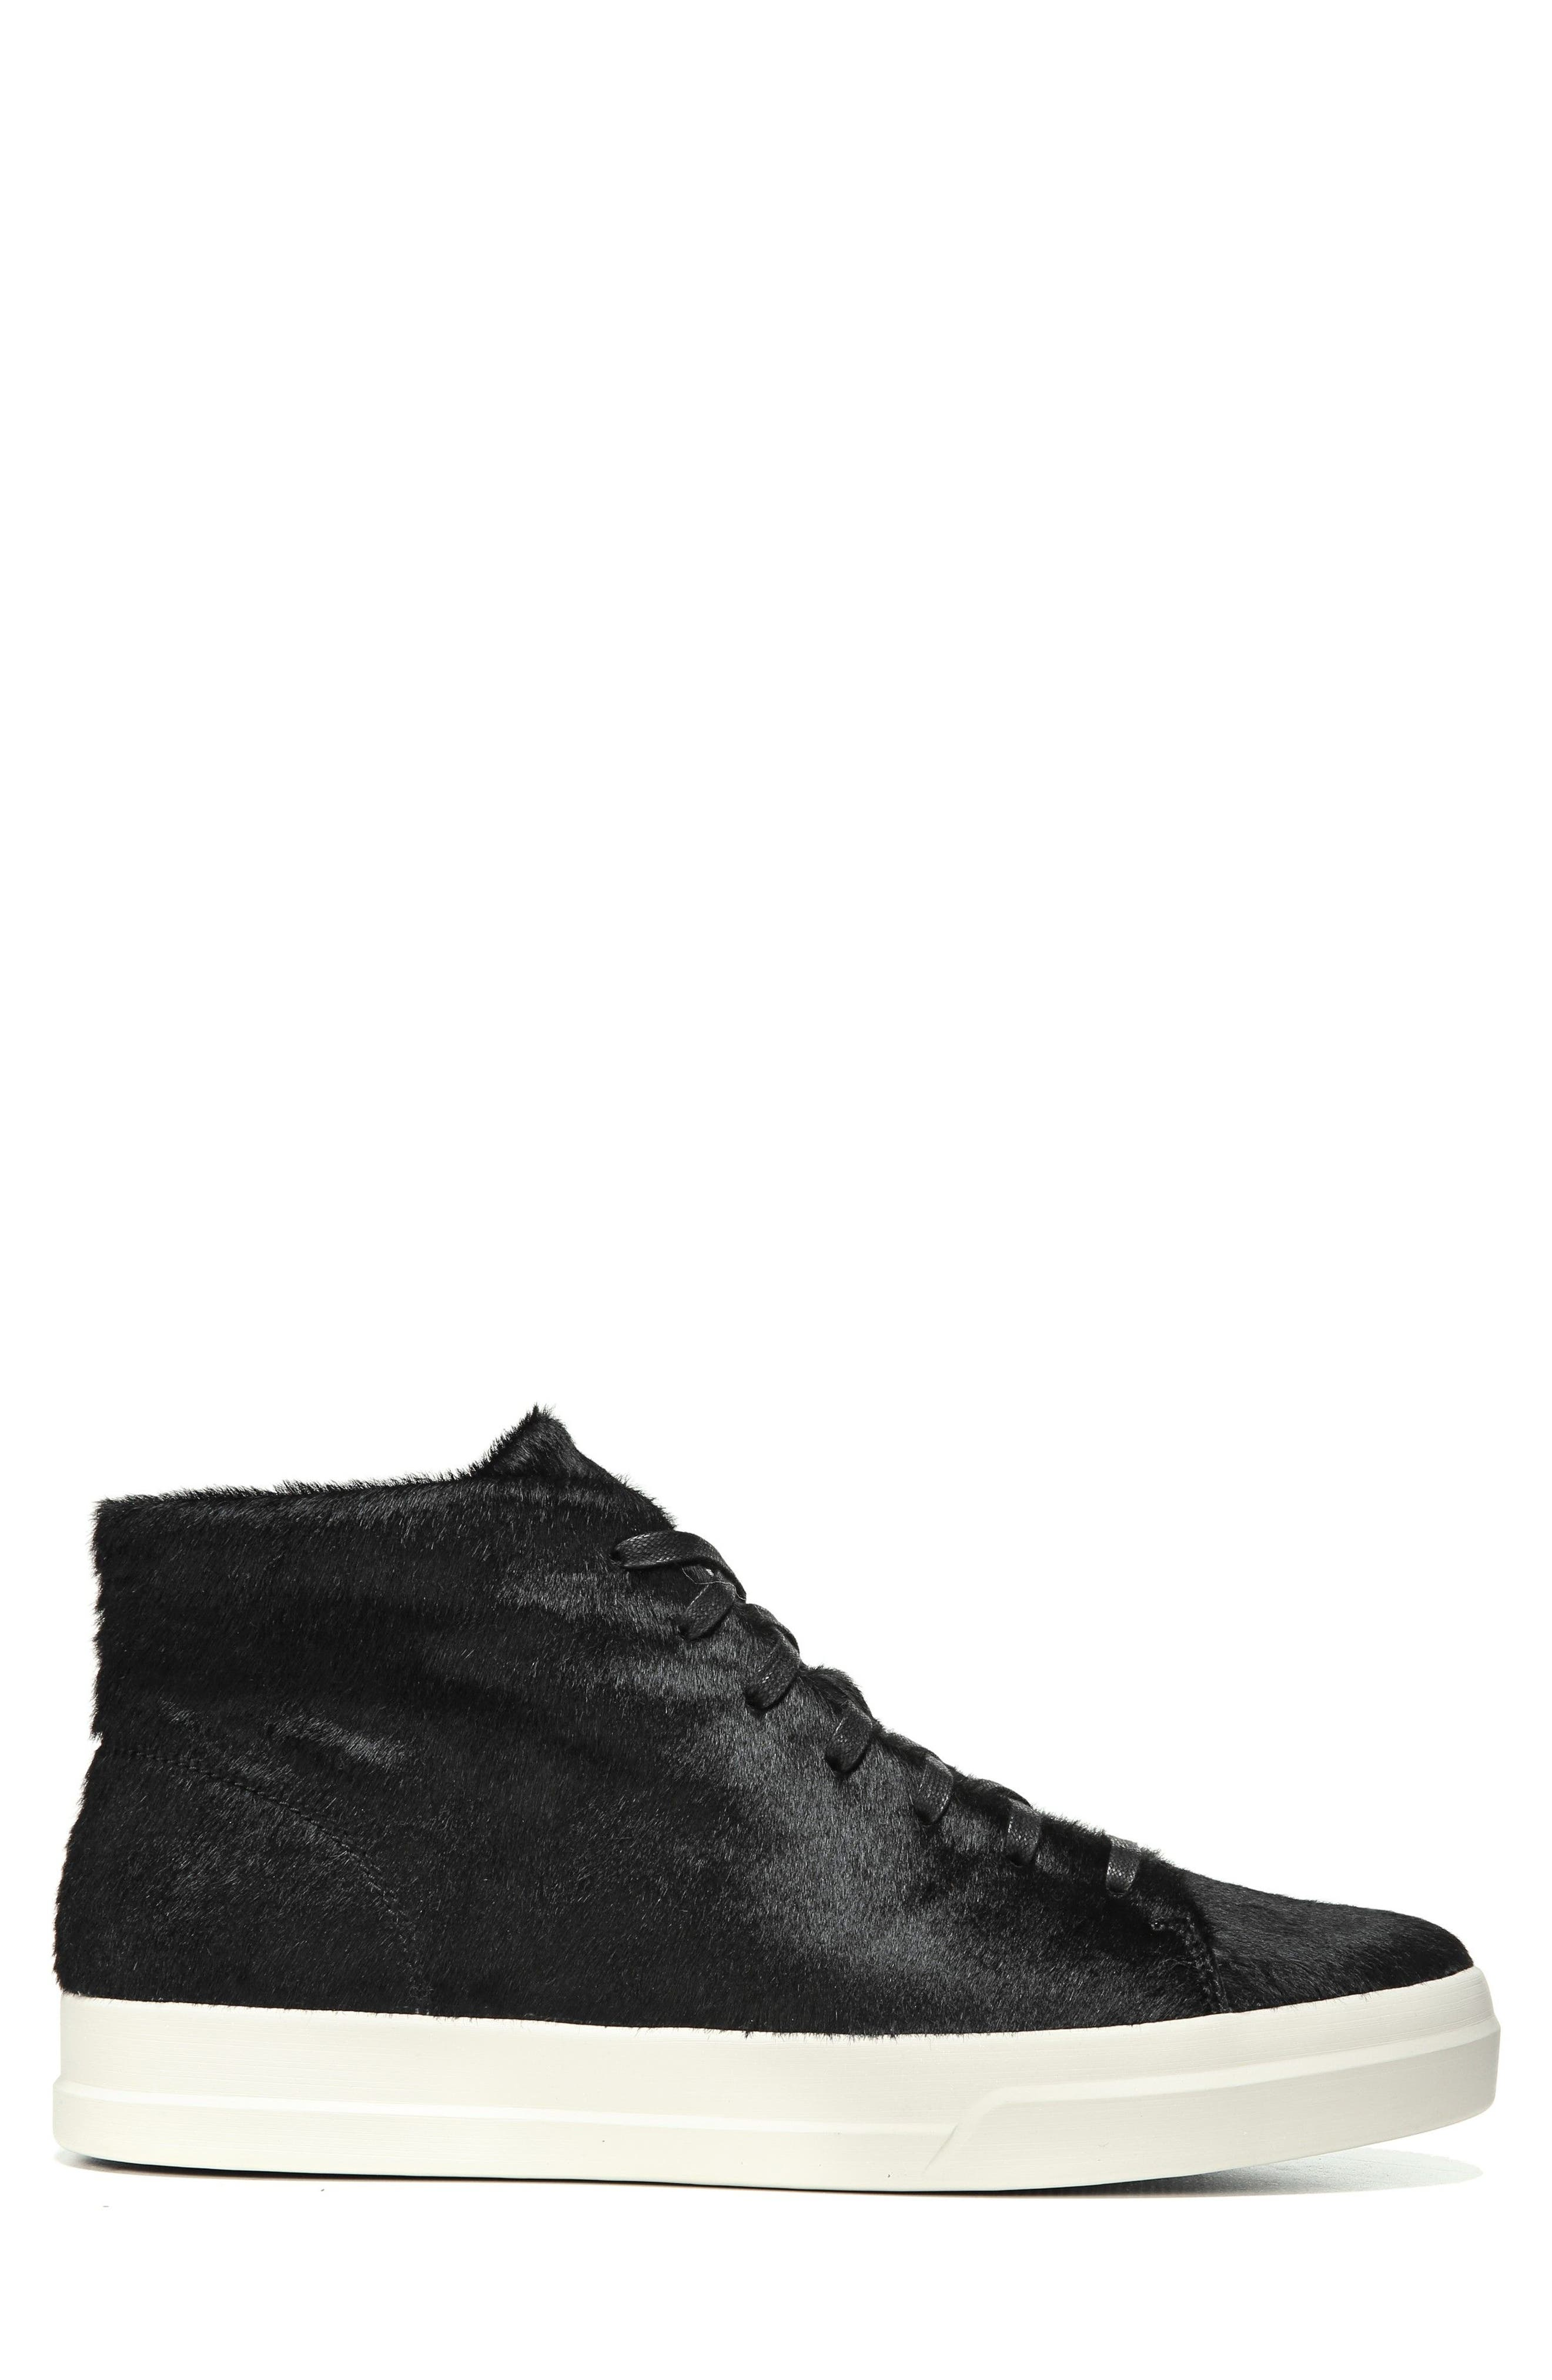 Cullen Sneaker,                             Alternate thumbnail 3, color,                             002